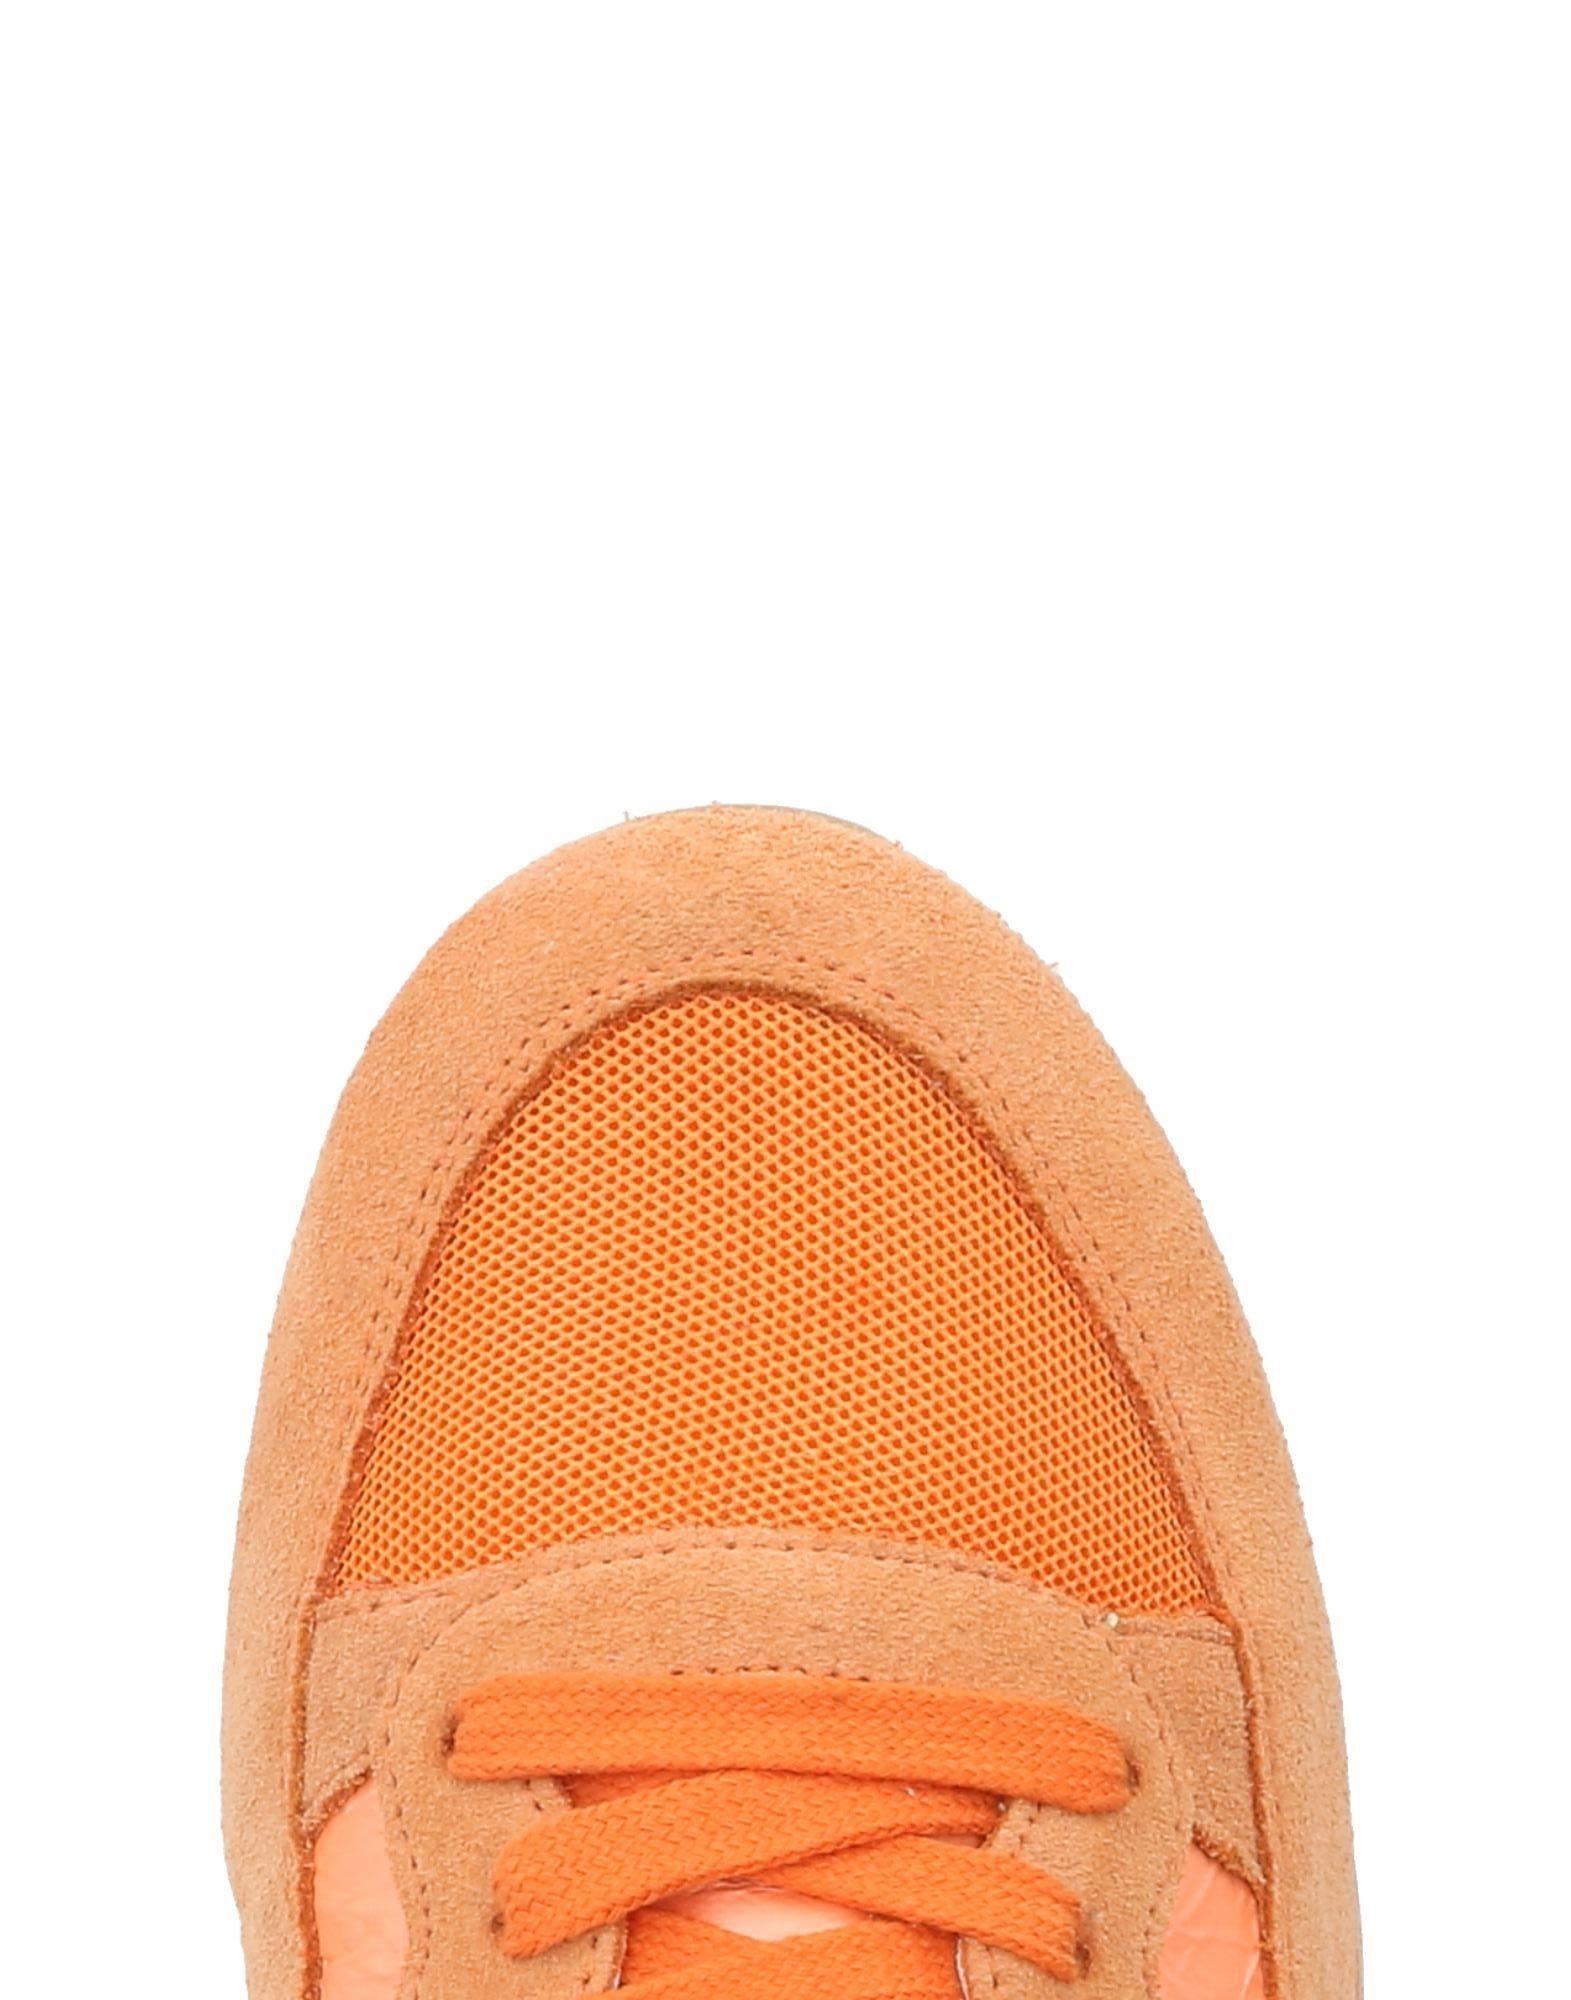 Quattrobarradodici Sneakers Damen  11434557KO Schuhe Gute Qualität beliebte Schuhe 11434557KO 2e669a